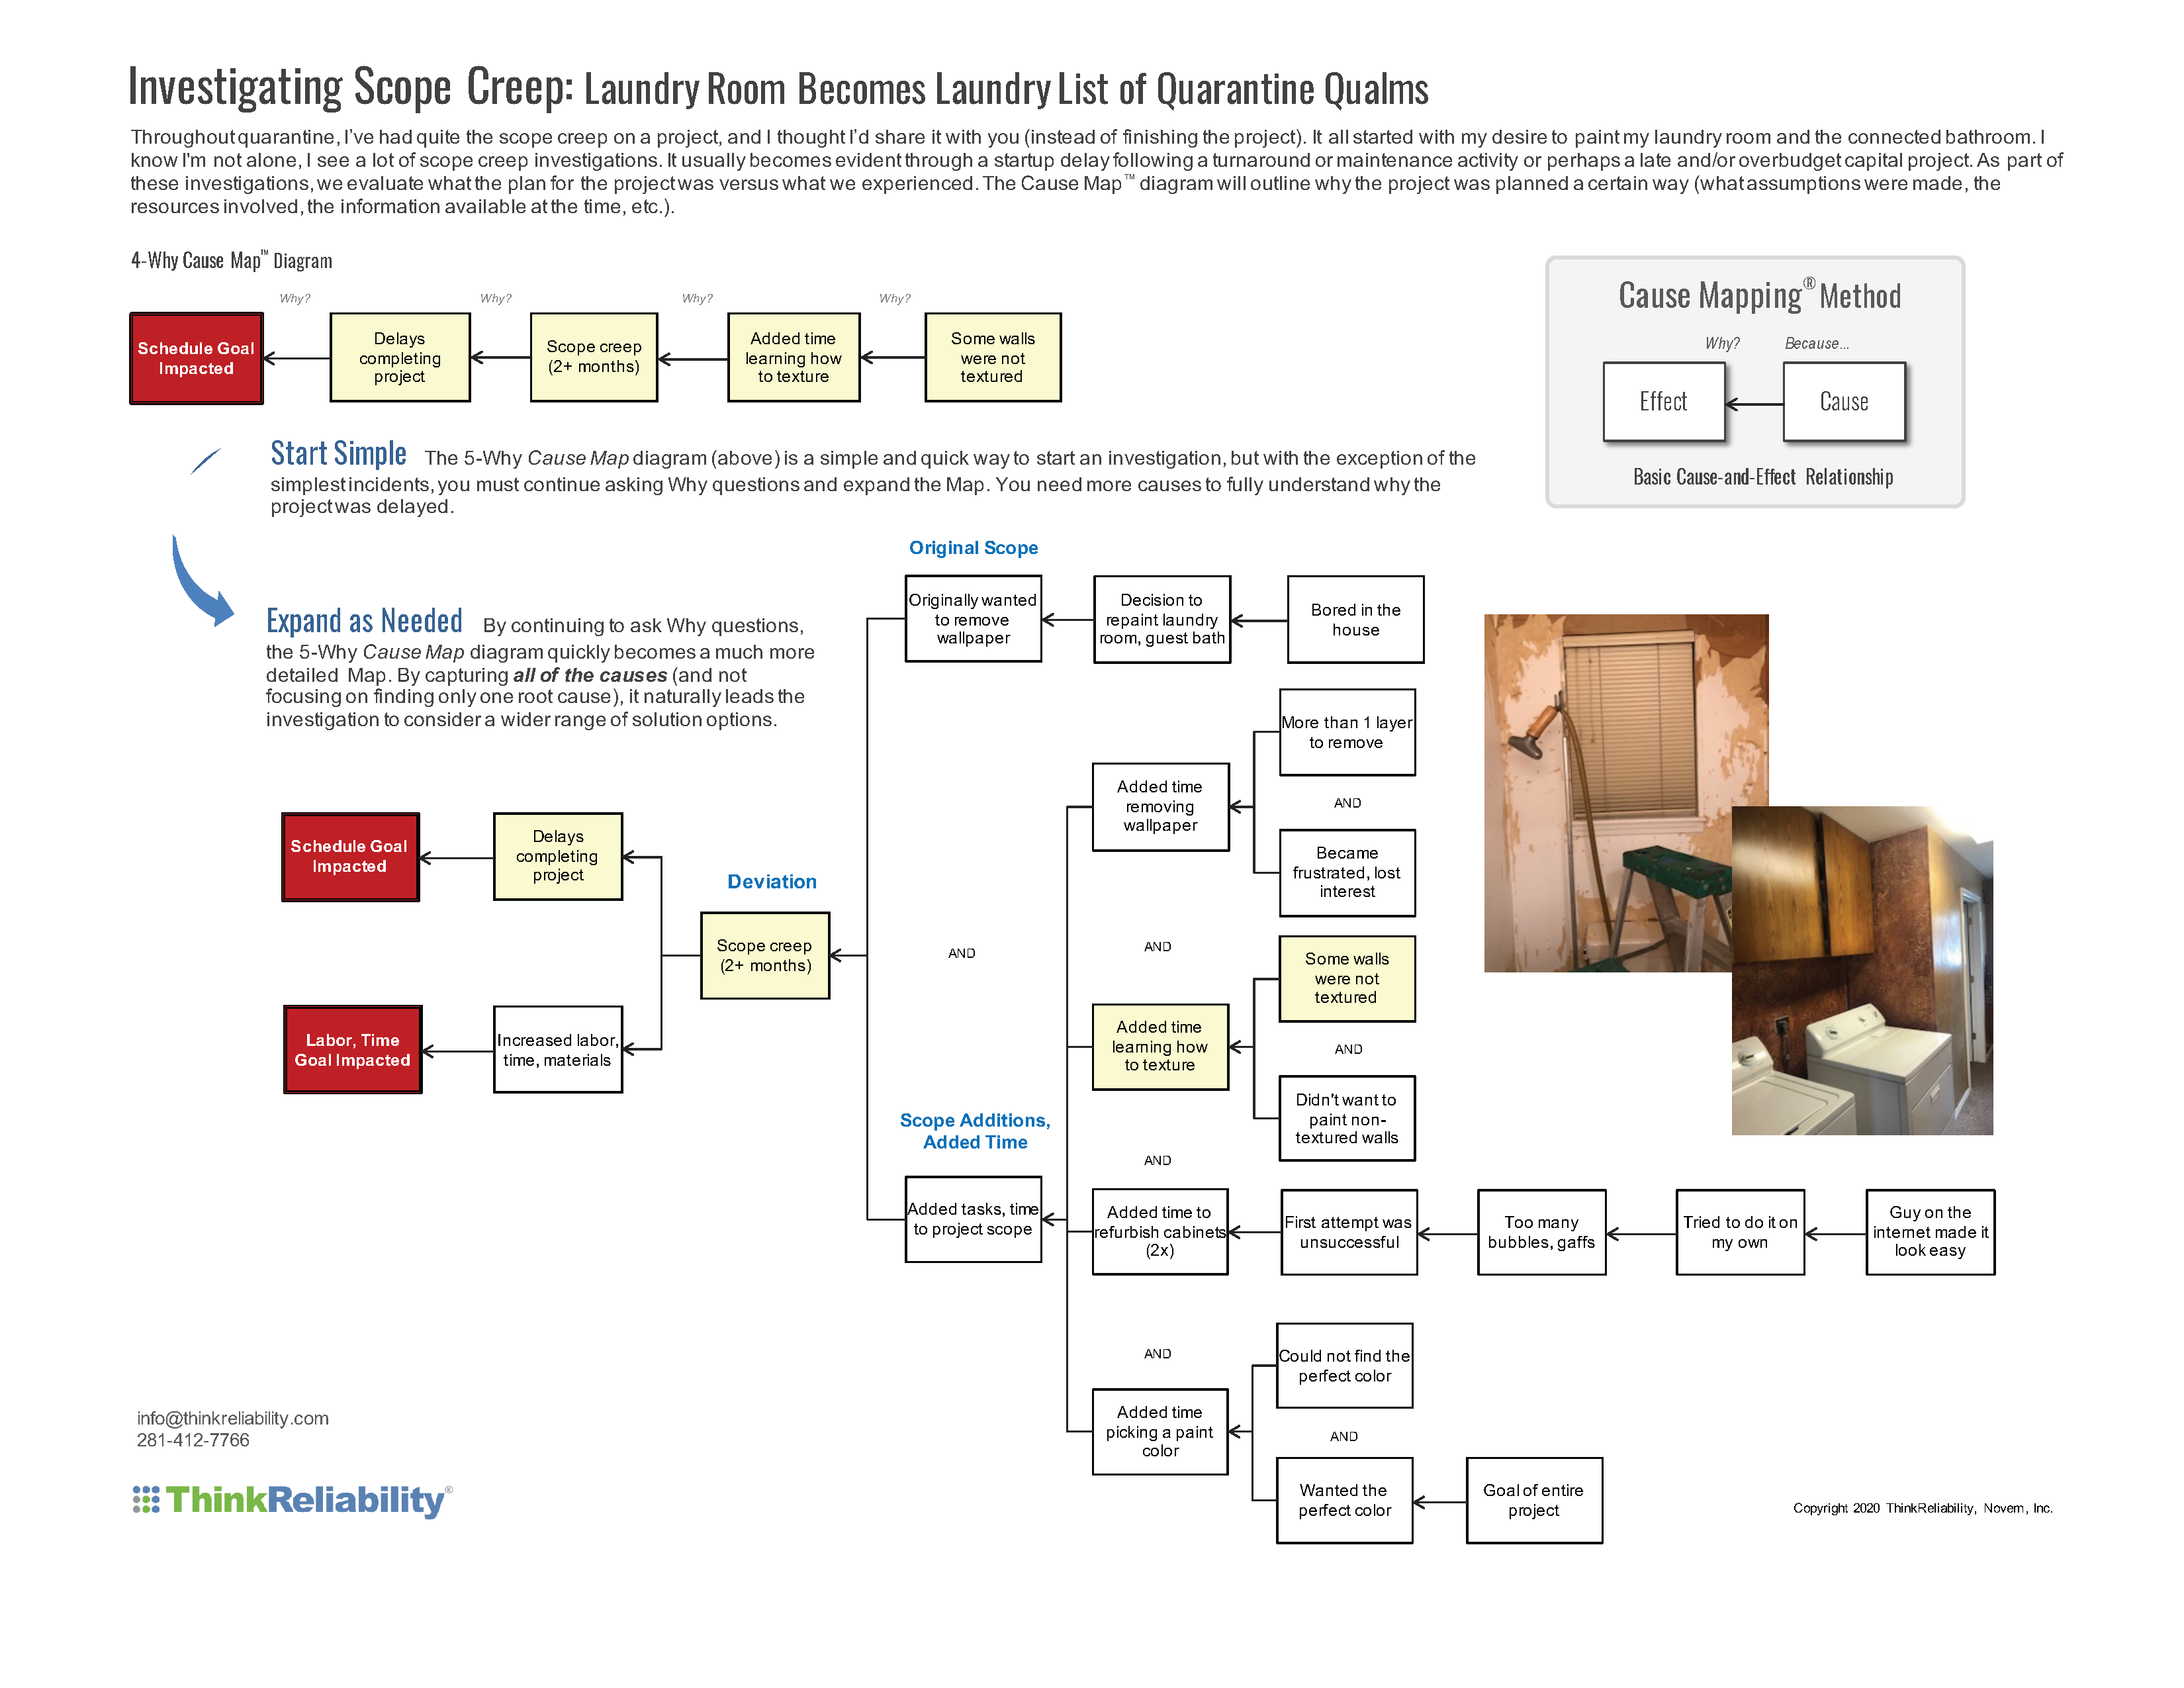 Laundry Room Scope Creep Cause Map Diagram